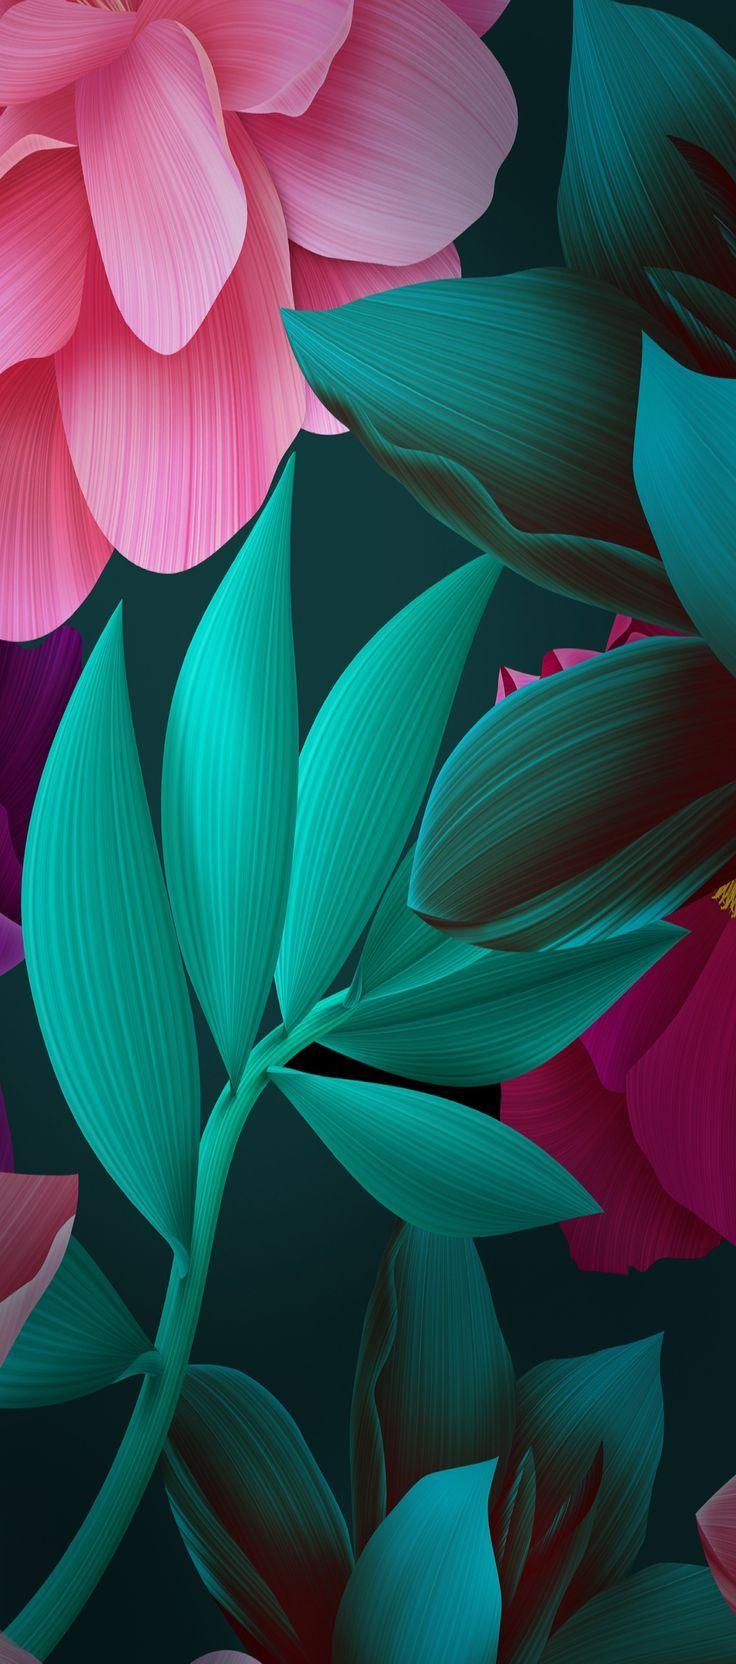 Mountain 1242×2208 ios6 png #wallpaper #iphonewallpaper #nature – Wallpaper HD Phone